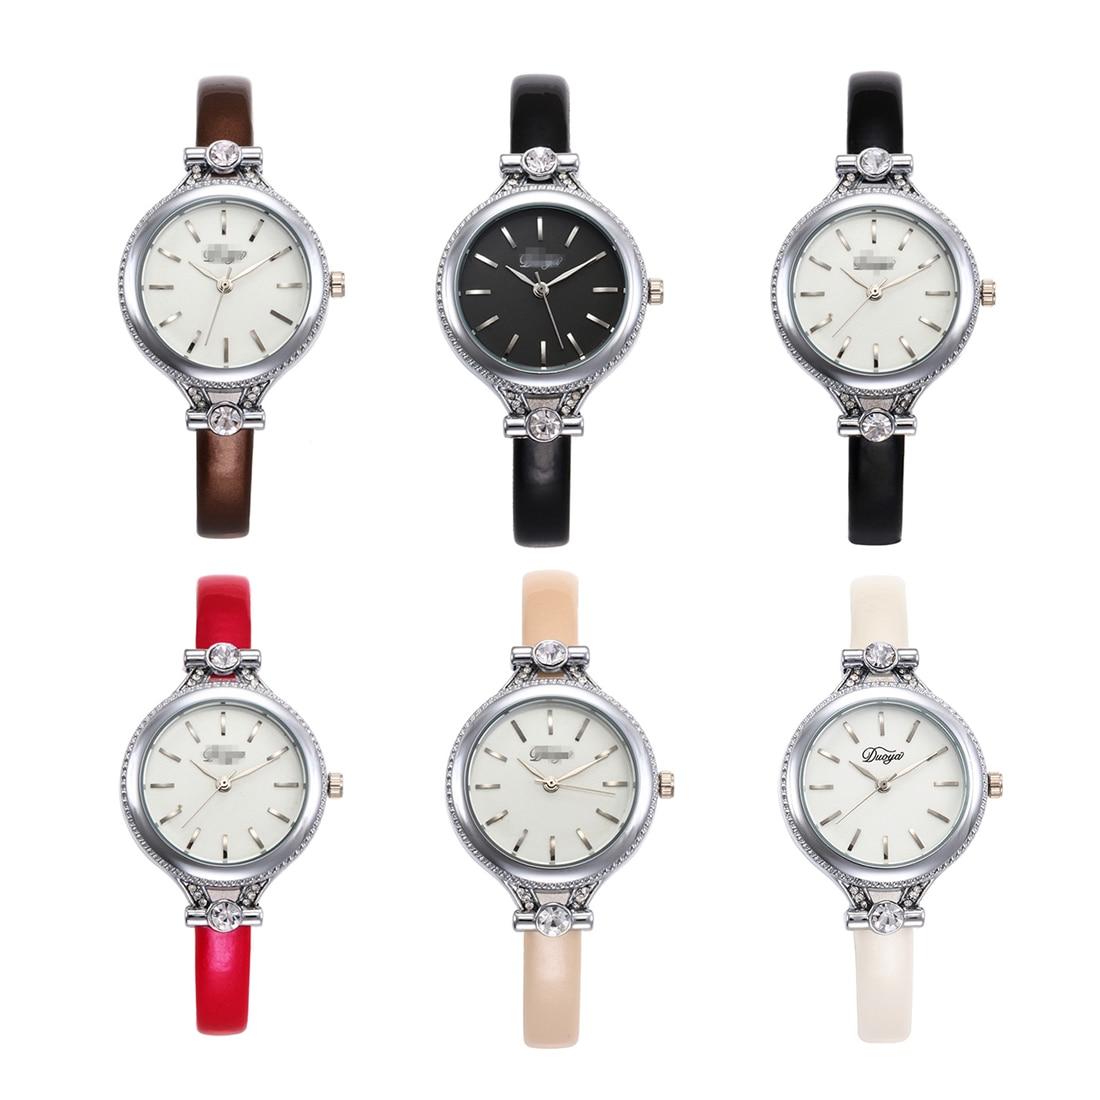 2018 New Fashion Relogio Feminino Womne Wrist Watches Ultra Thin Rosefield Watch Montre Femme Ladies Business Clock Dropship